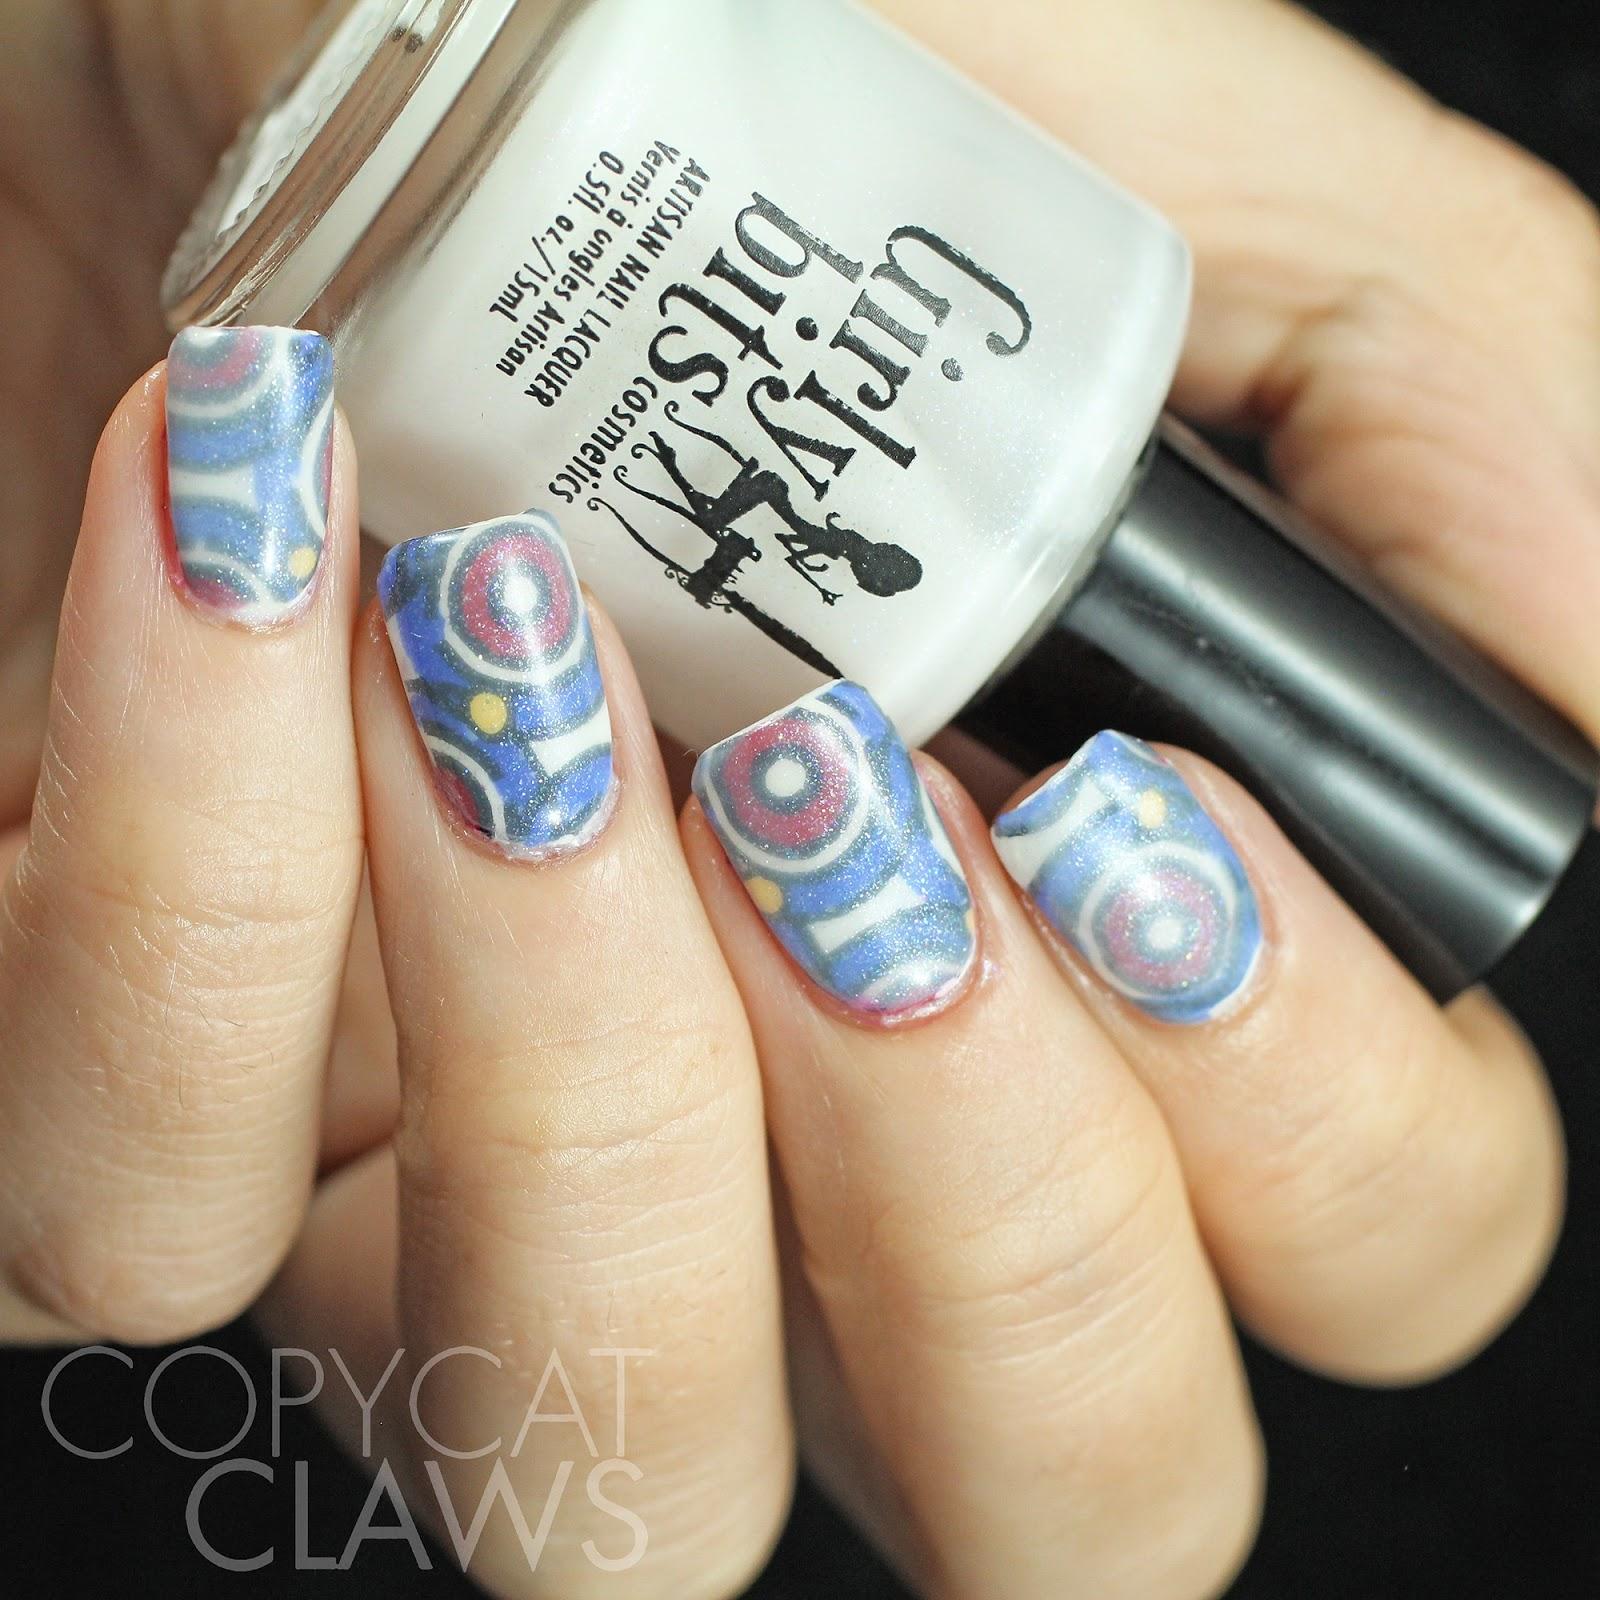 Copycat Claws Blue Color Block Nail Art: Copycat Claws: 40 Great Nail Art Ideas